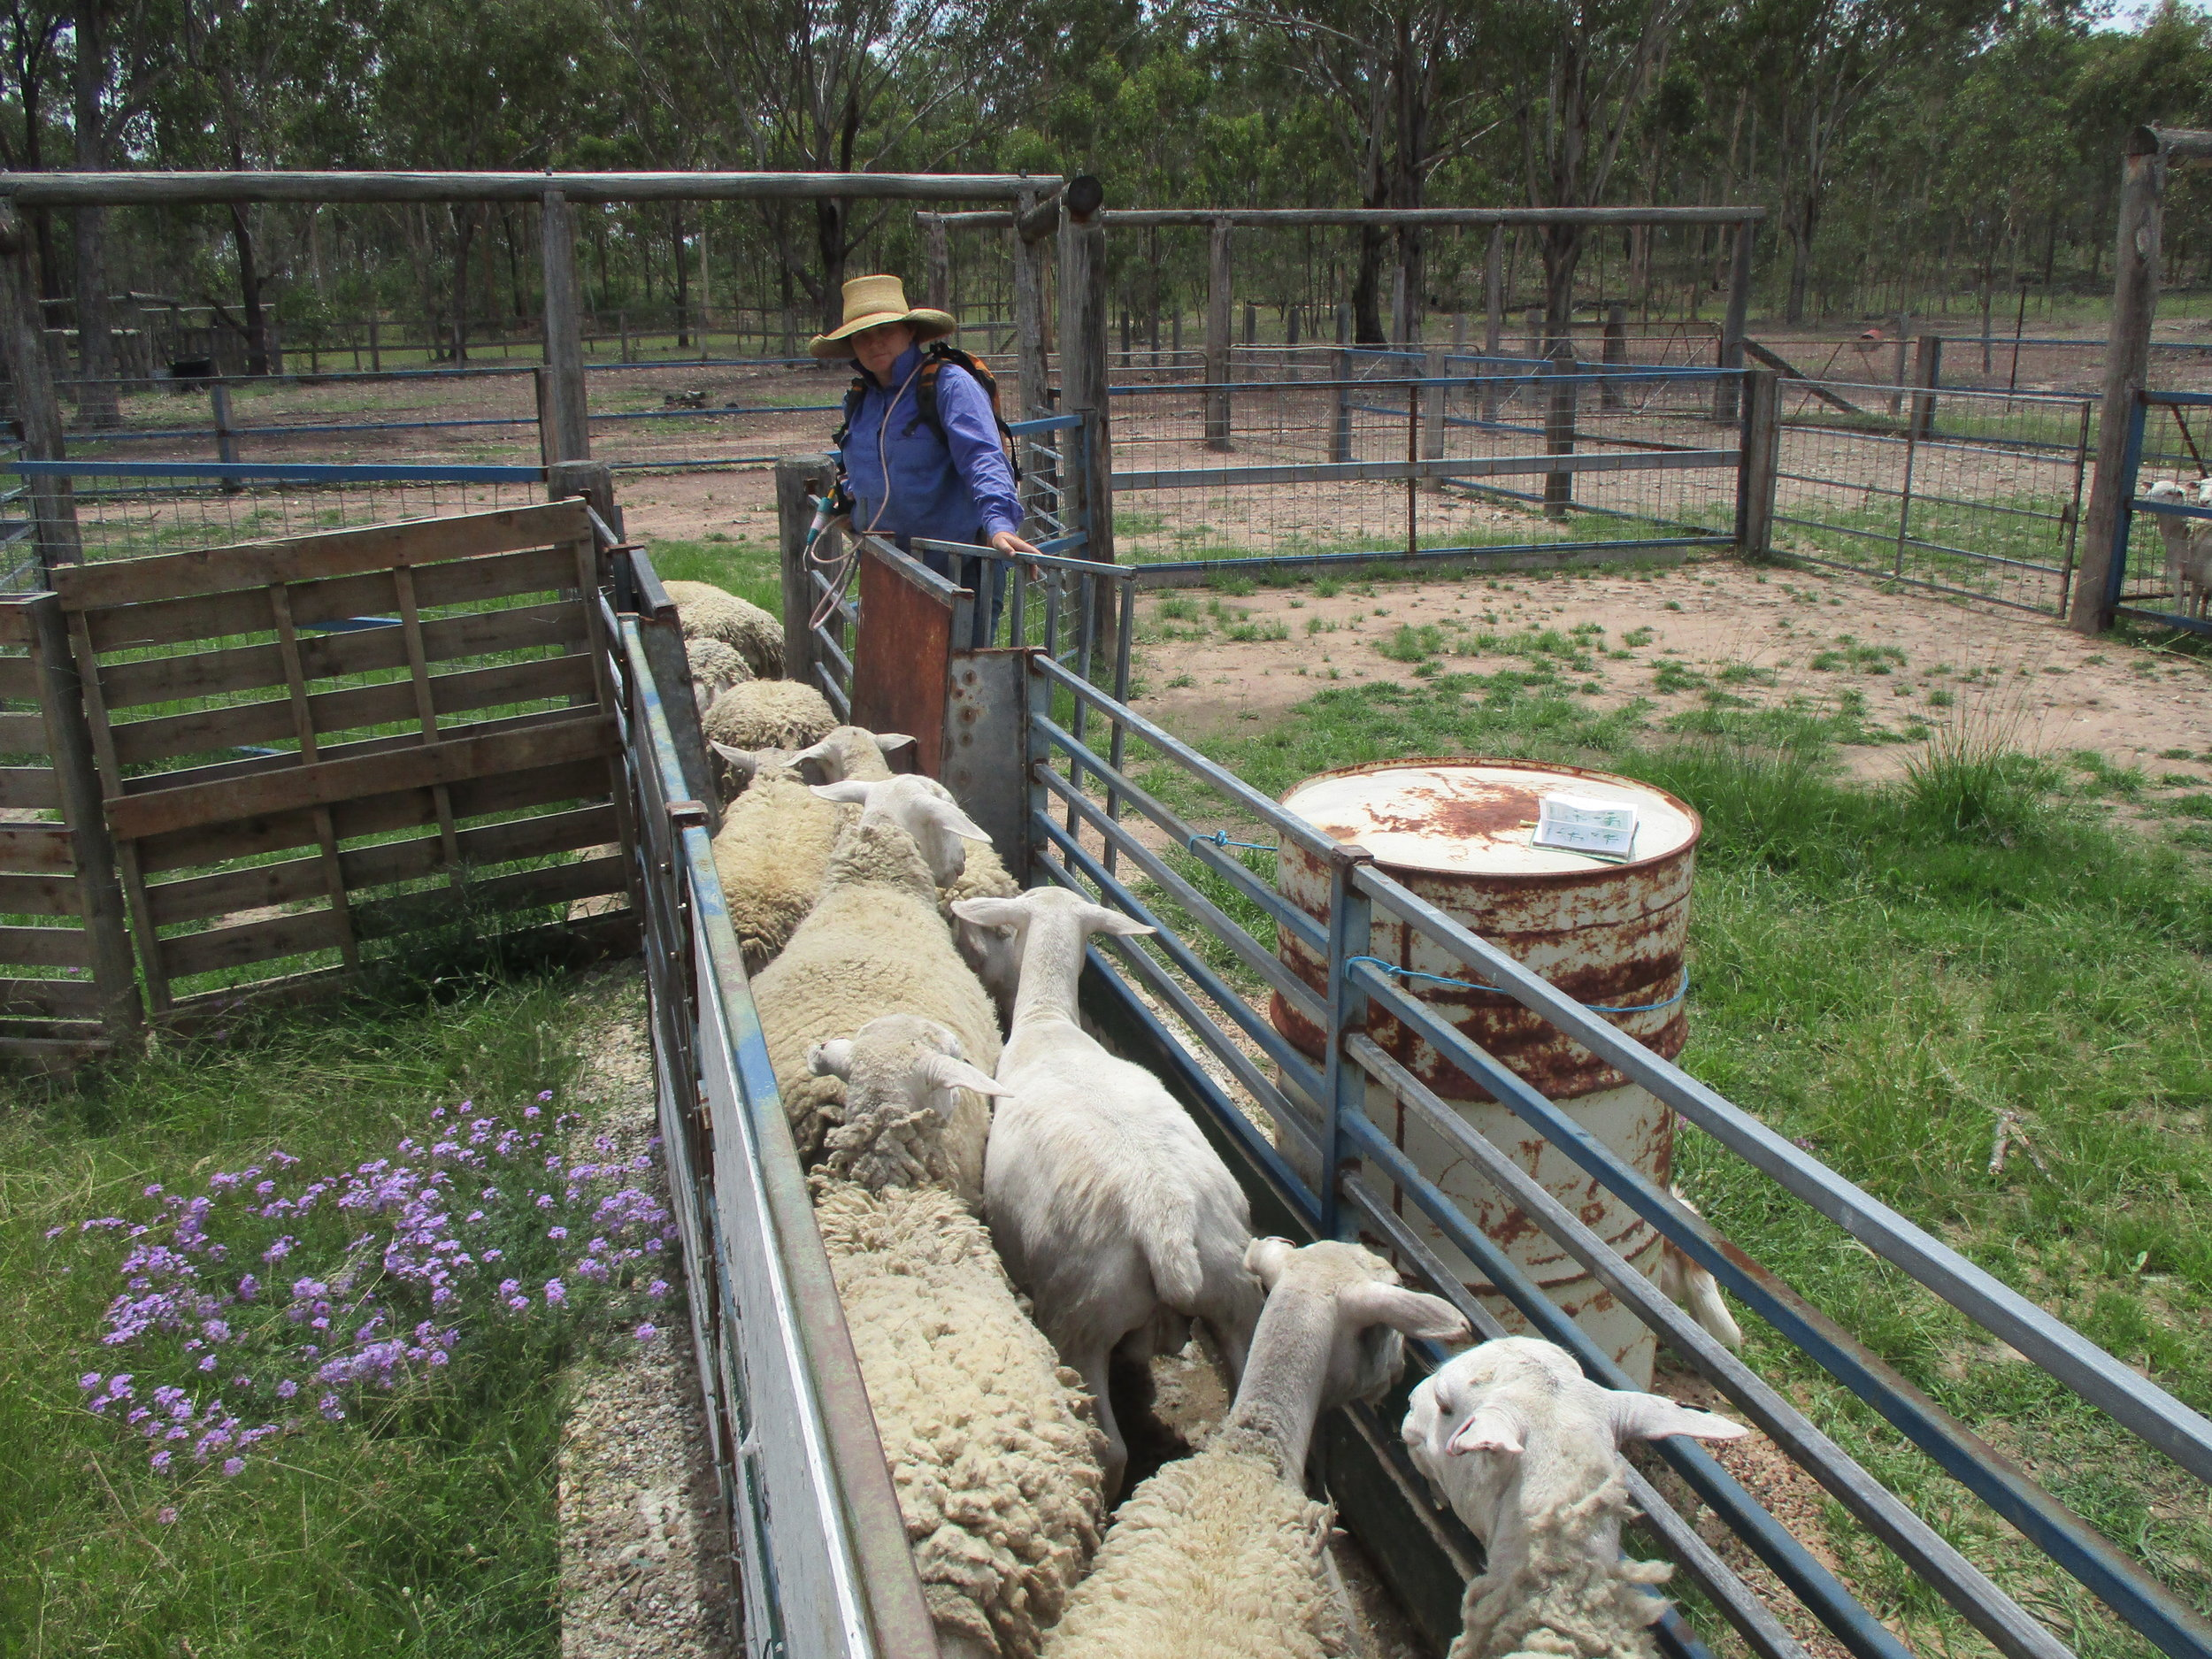 Working sheep in the 'Honeymoon Yard', 2017, image supplied.